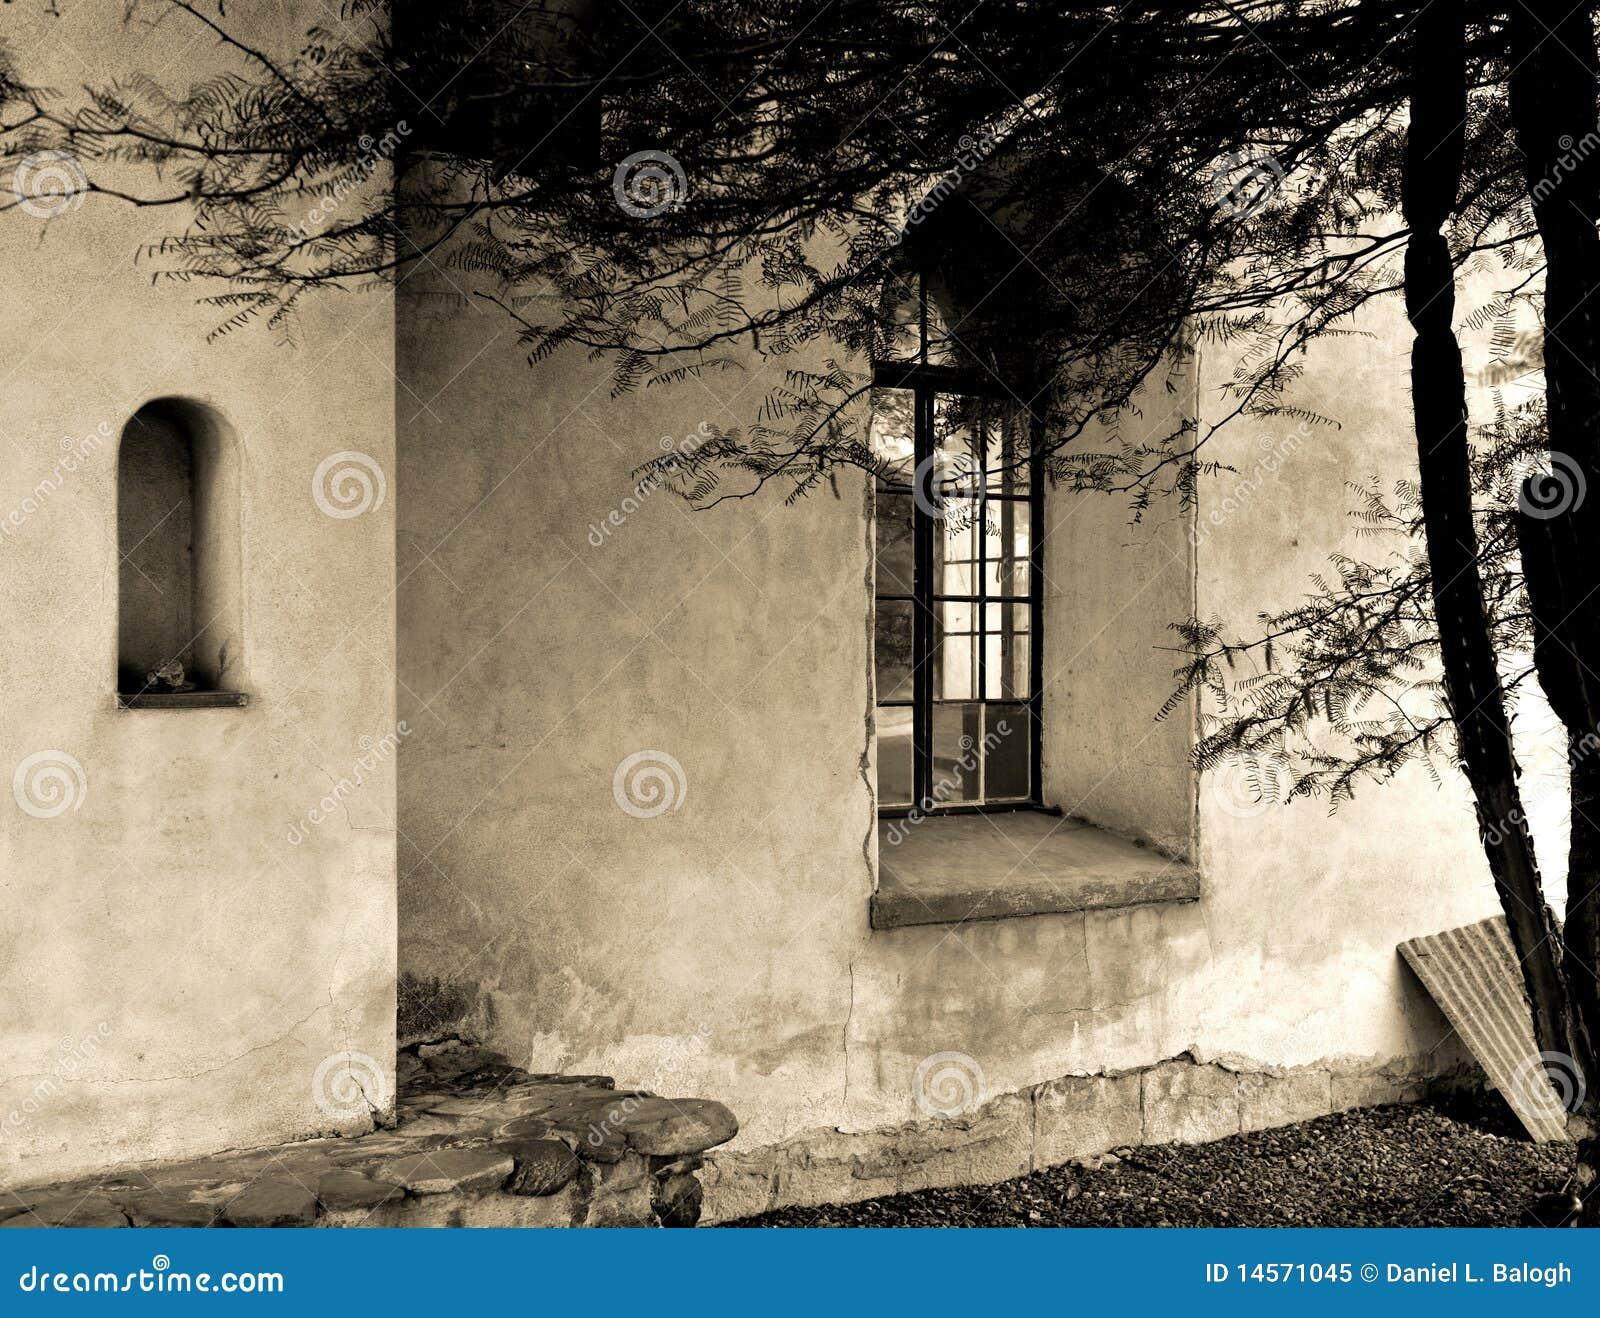 adobe homes in arizona royalty free stock photo image 14571045